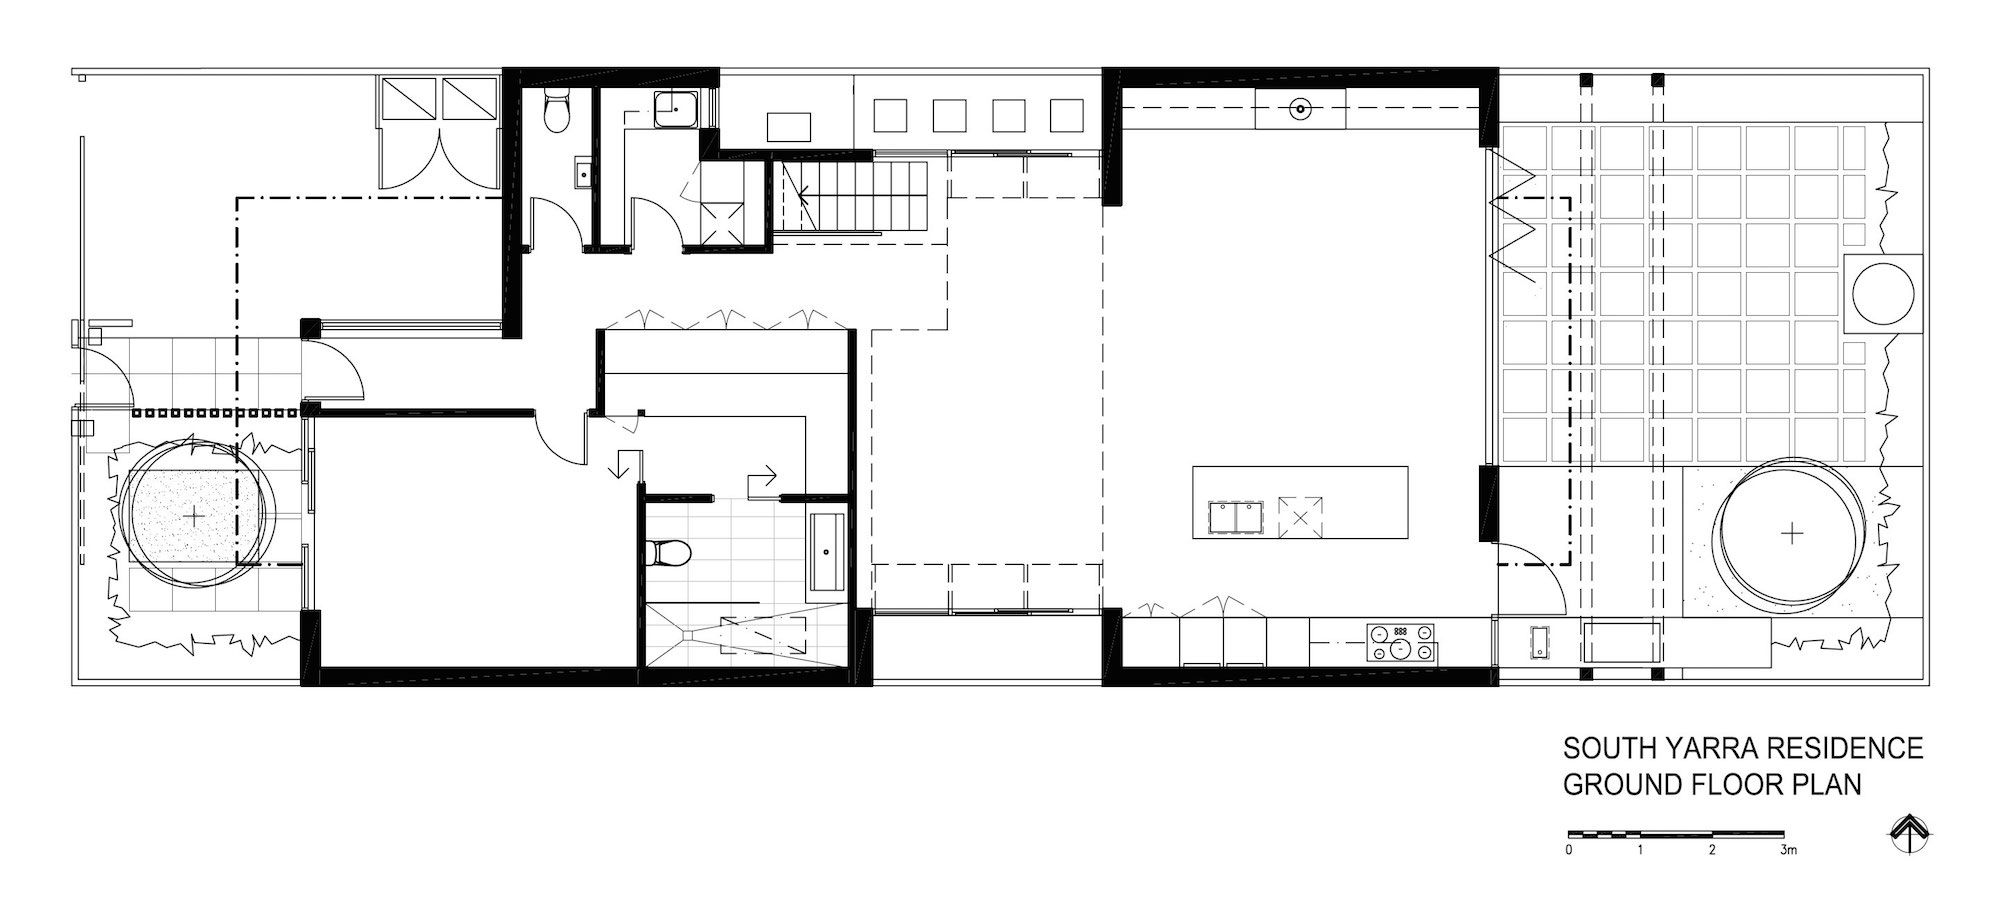 Dise o de casa moderna de dos plantas planos construye for Planos casas modernas 2 plantas